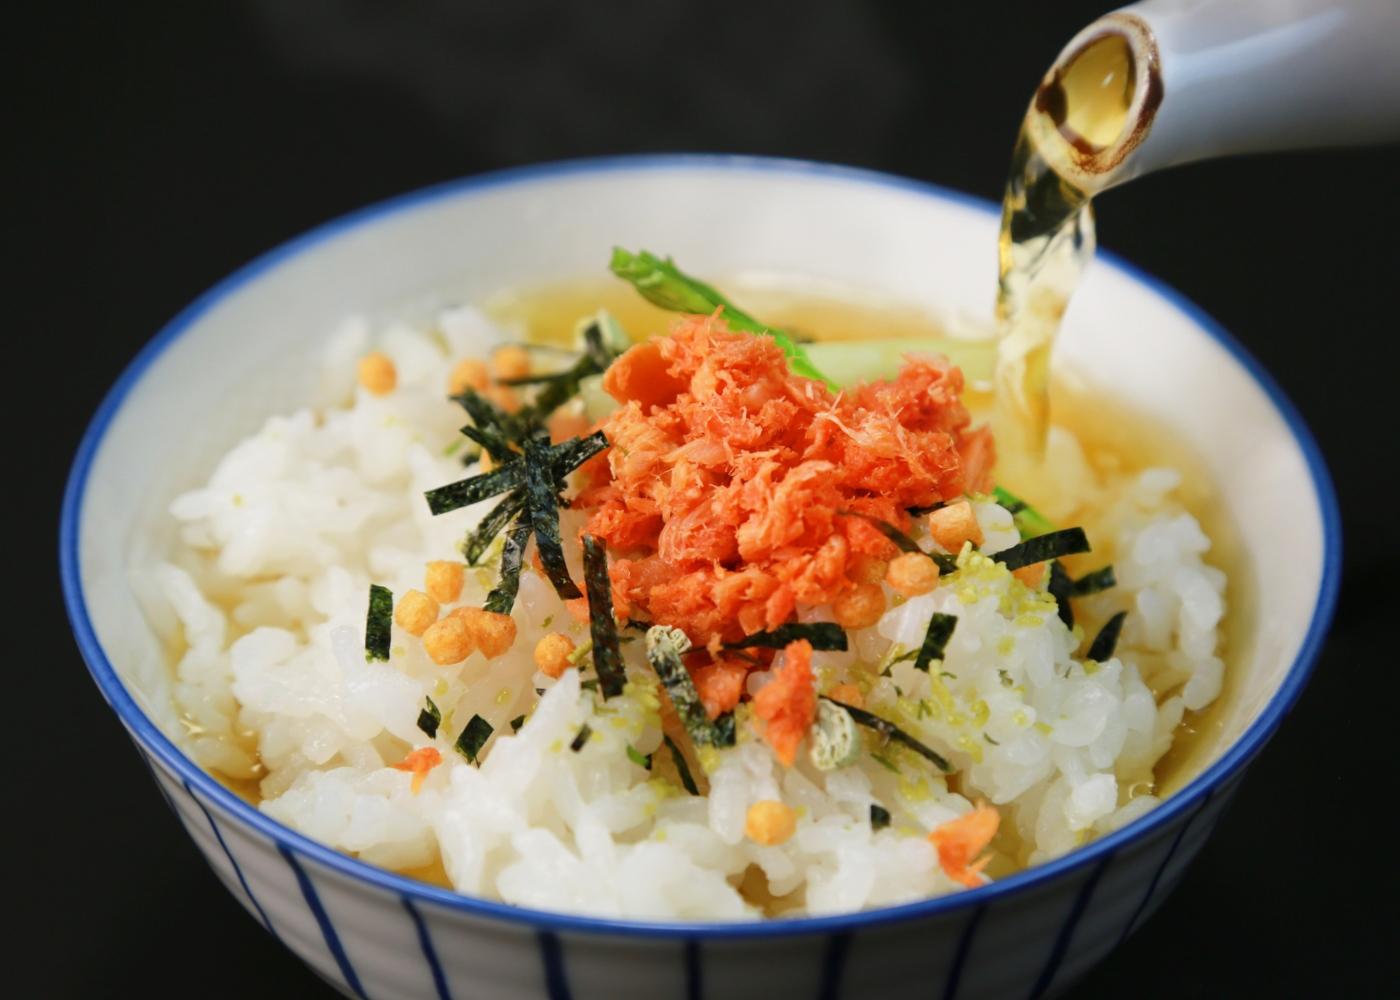 Ochazuke: arroz submerso em chá